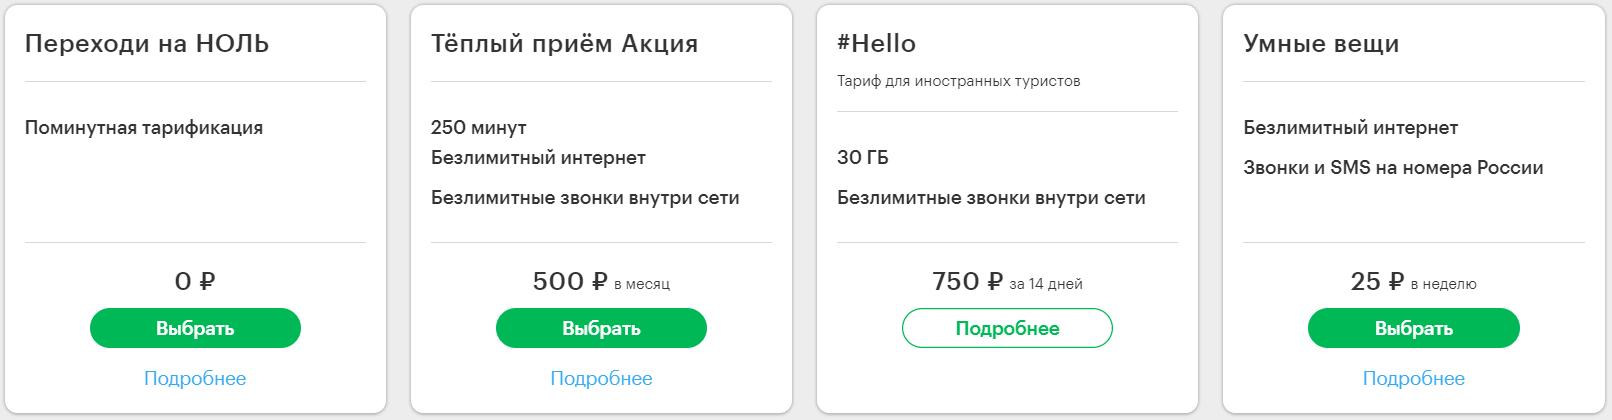 meg-kemerovo-1.png